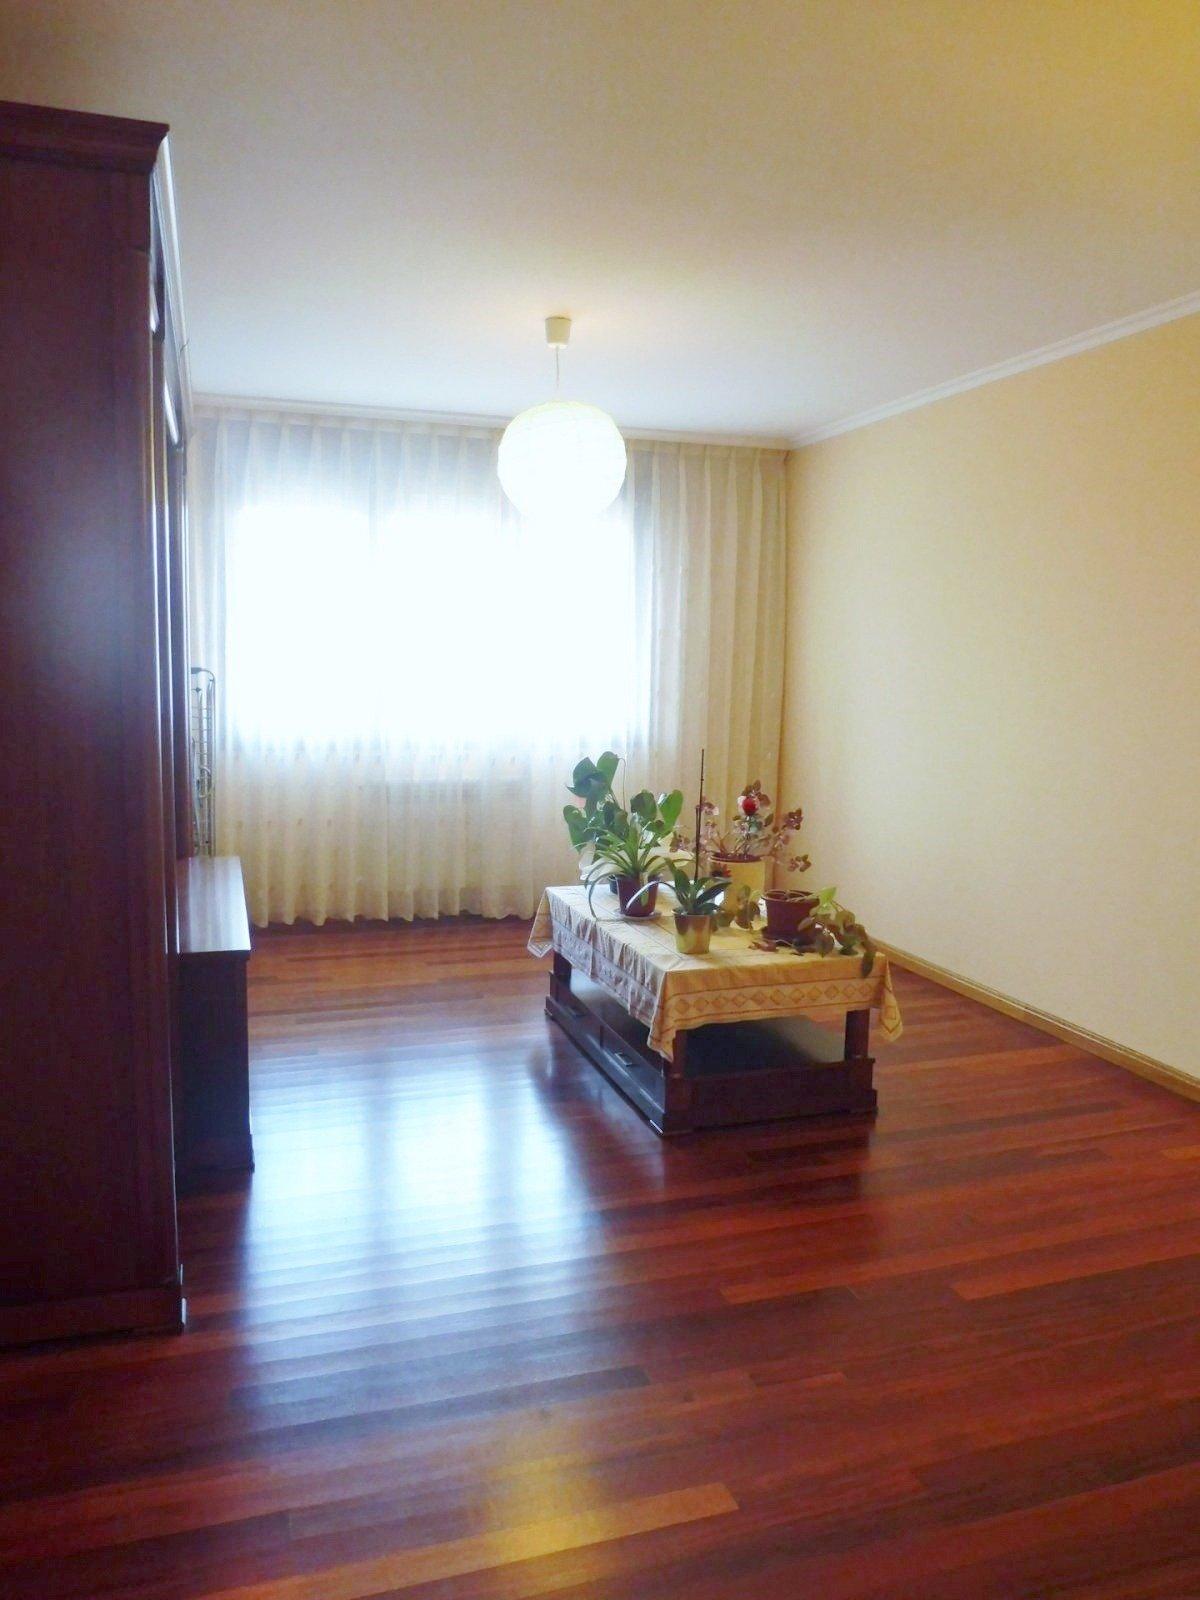 Bonito piso seminuevo - imagenInmueble8